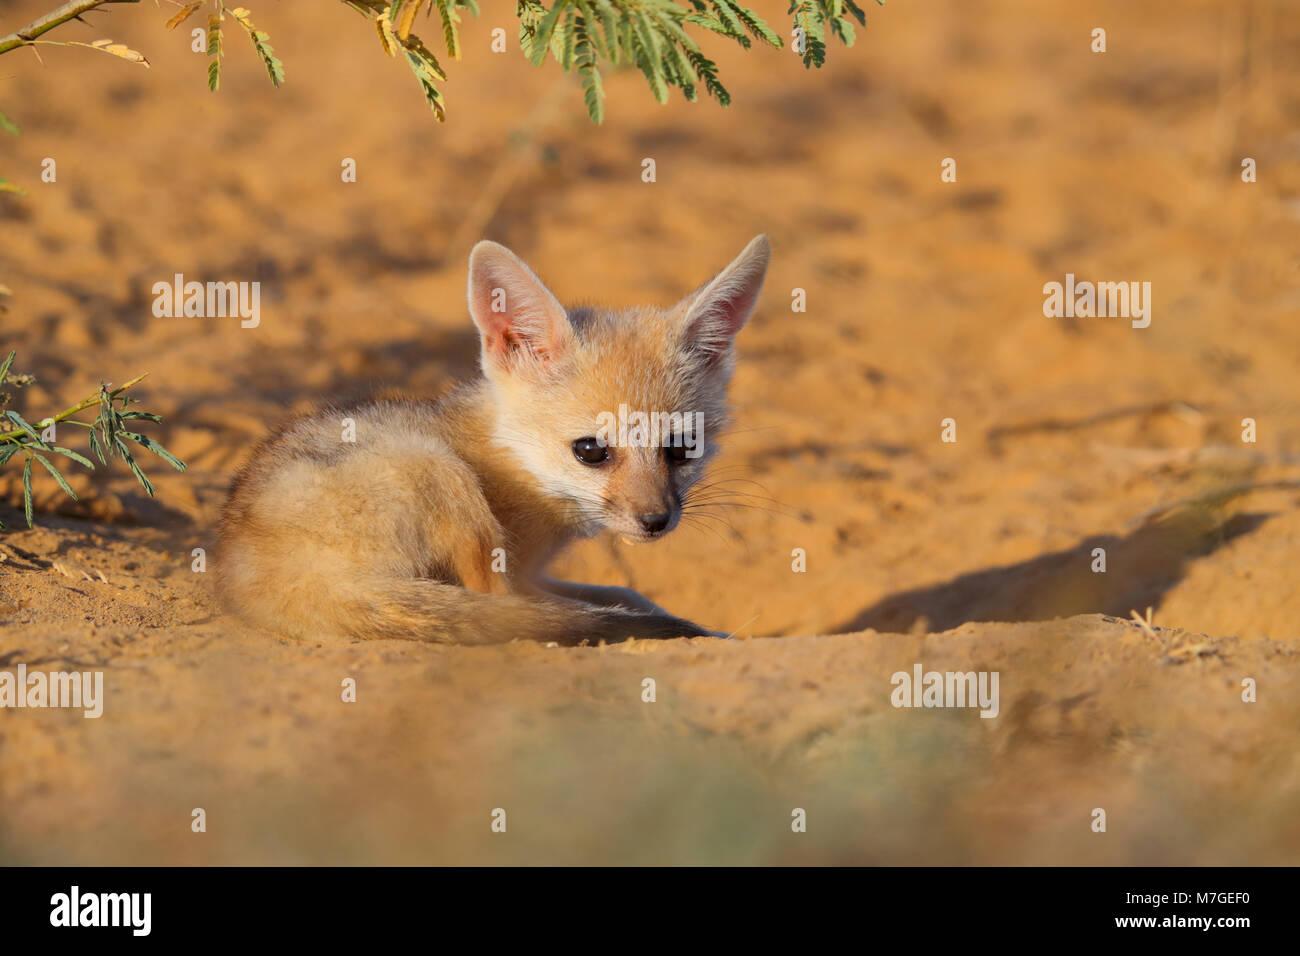 Indian or Bengal Fox cub (Vulpes bengalensis) sunbathing near the Great Rann of Kutch, Gujarat, India - Stock Image